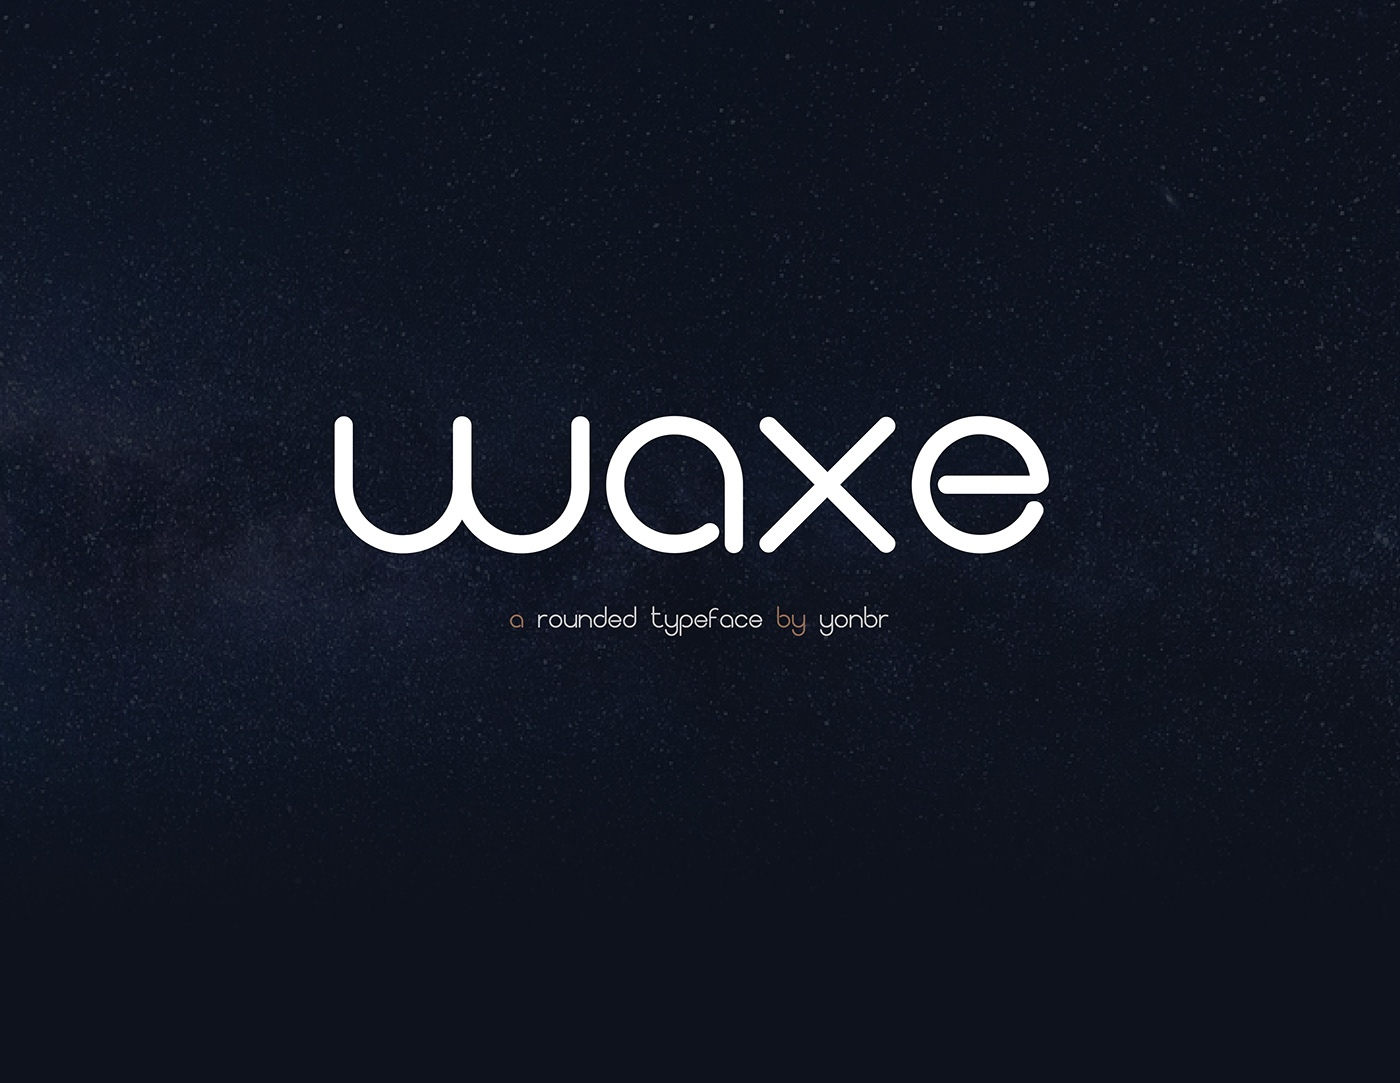 Waxe简约时尚logo设计圆润英文字体下载